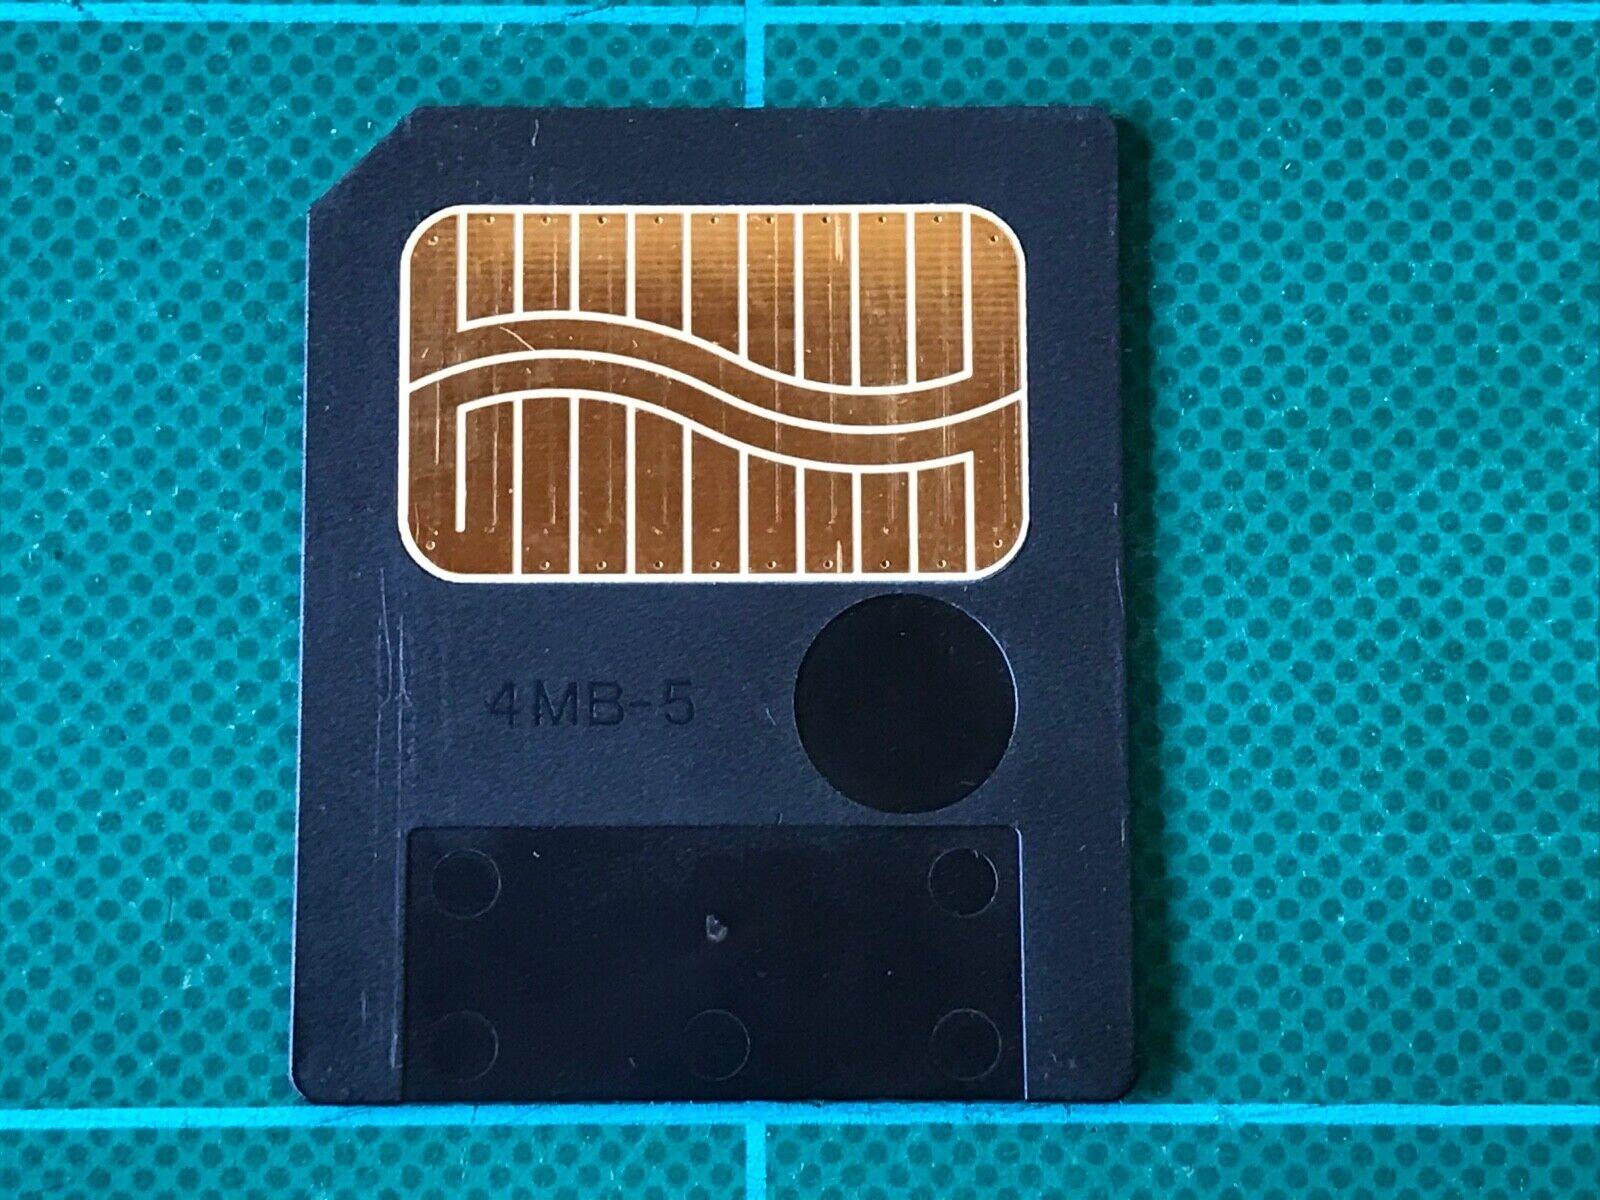 Roland S4M-5 4MB Smart Media Card 5V SP202 MC505 JX305 JP8080 Free shipping